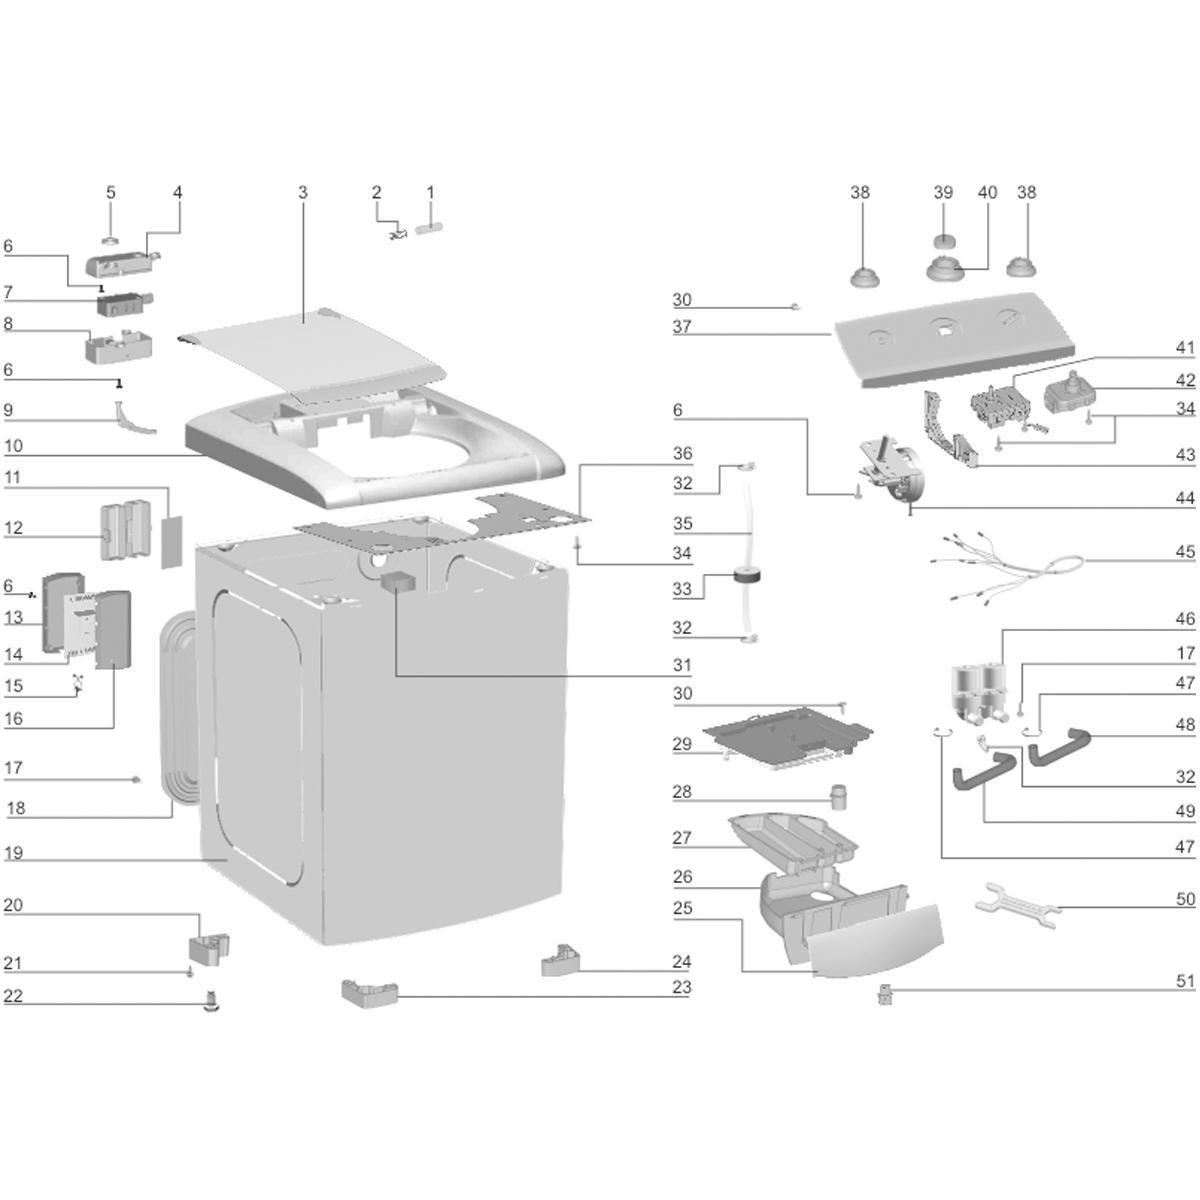 Chave Csi Para Lavadora De Roupas Top Load Ew110 Electrolux - 64484591